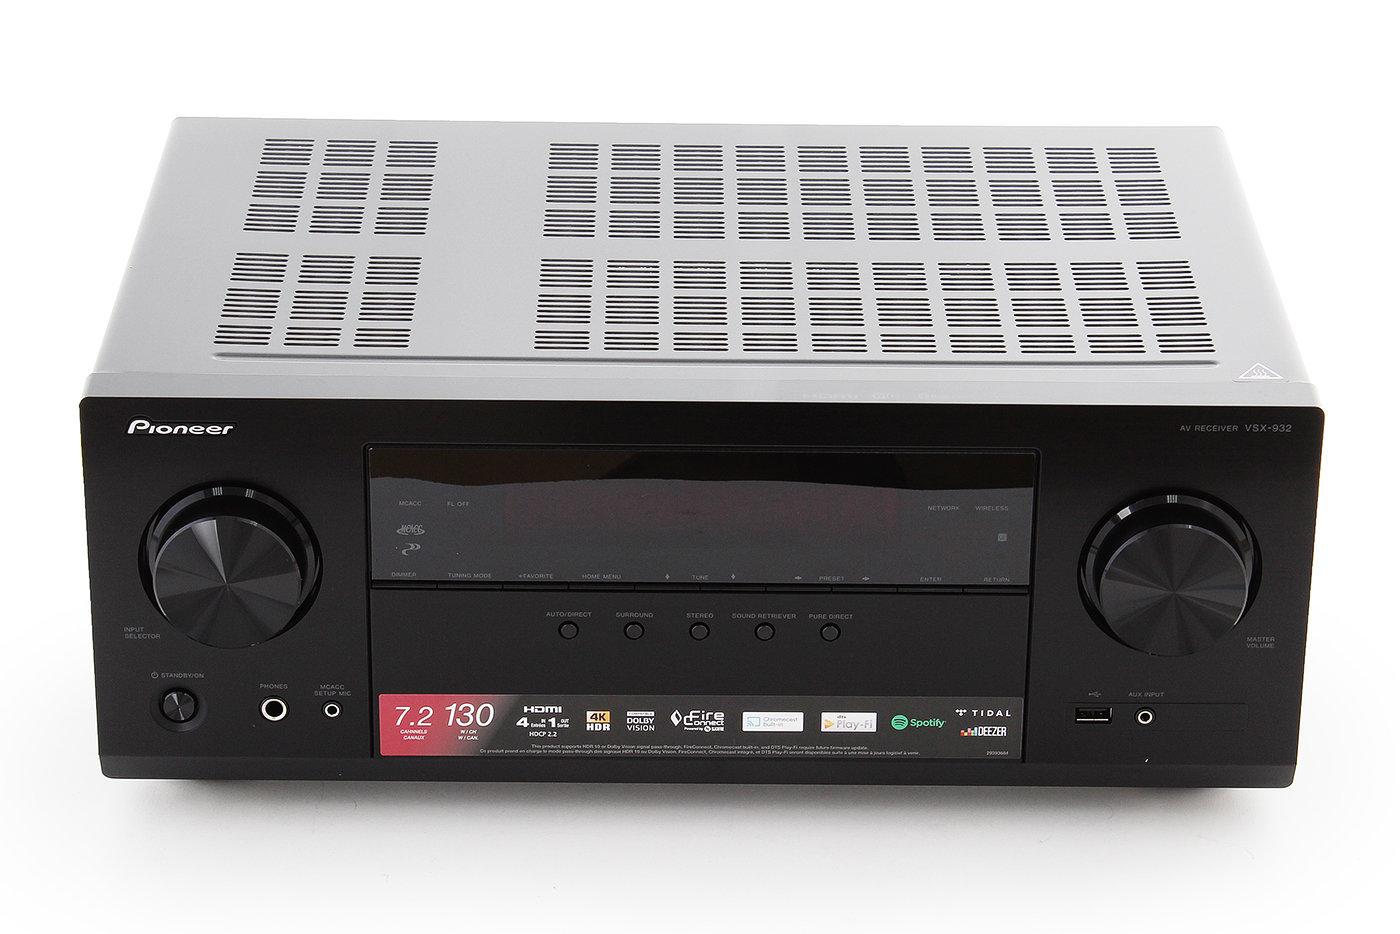 Ресивер Pioneer vsx-932-b